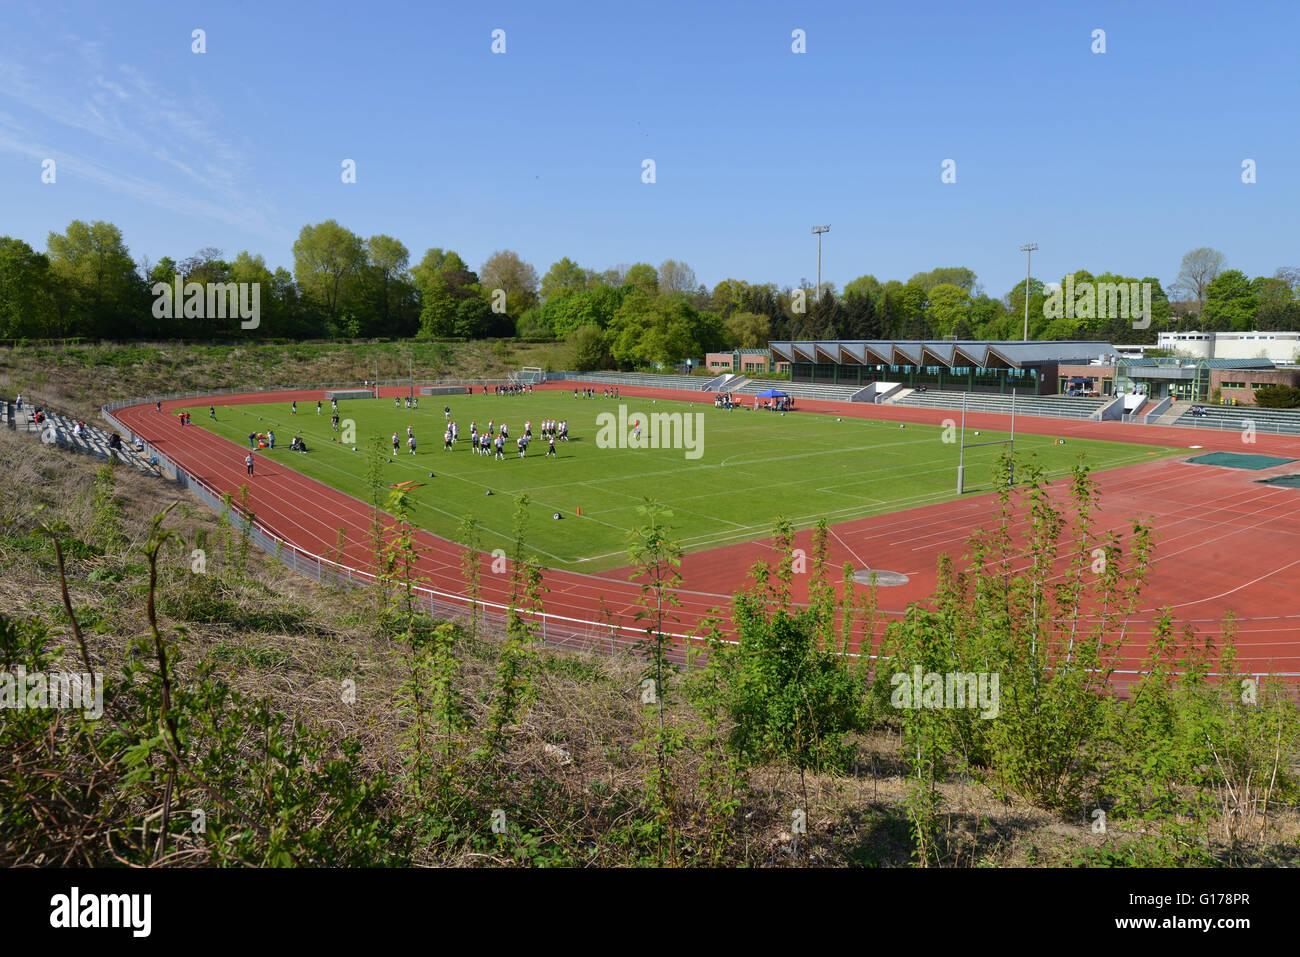 Stadion Wilmersdorf, Fritz-Wildung-Strasse, Wilmersdorf, Berlin, Deutschland - Stock Image